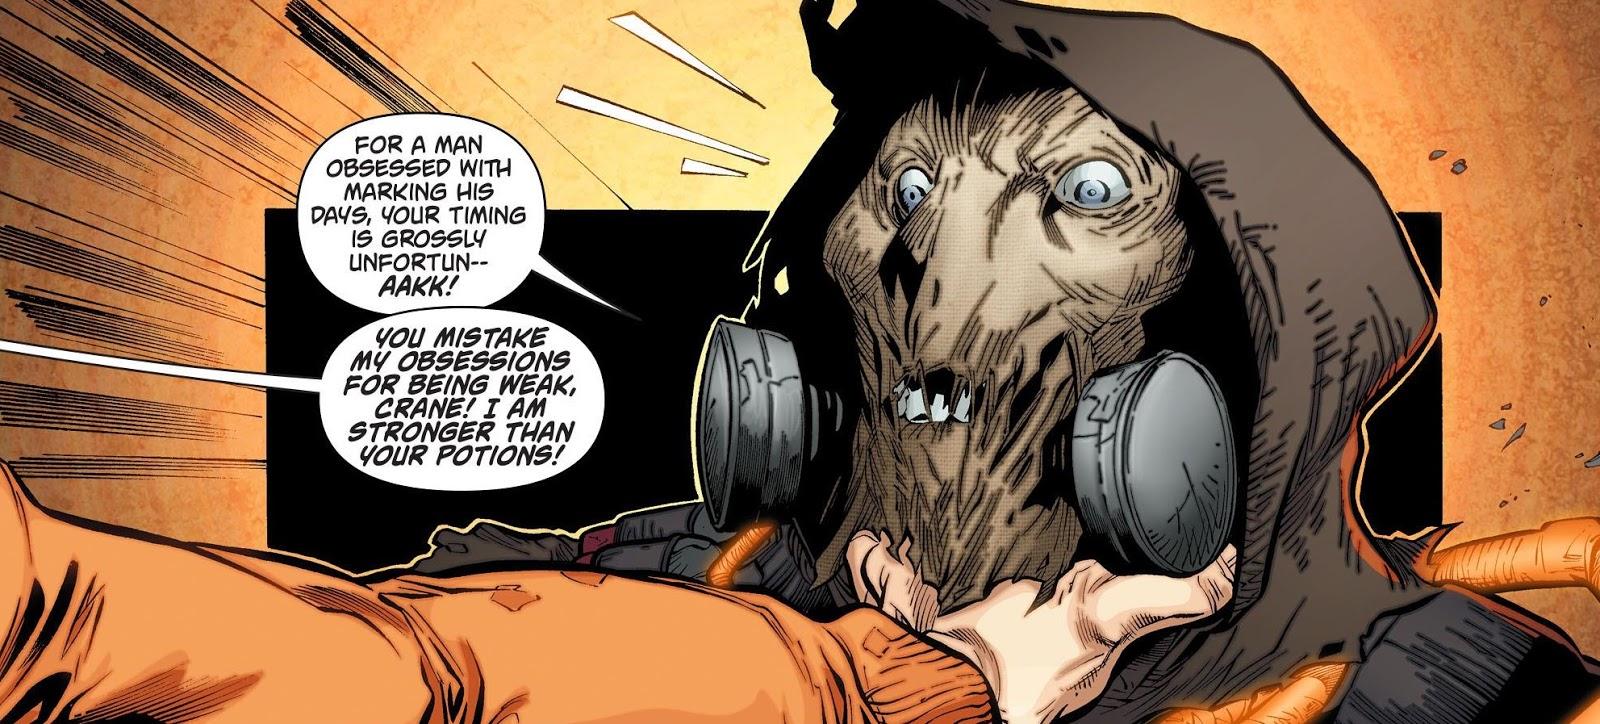 Batman Arkham Knight Comic Book